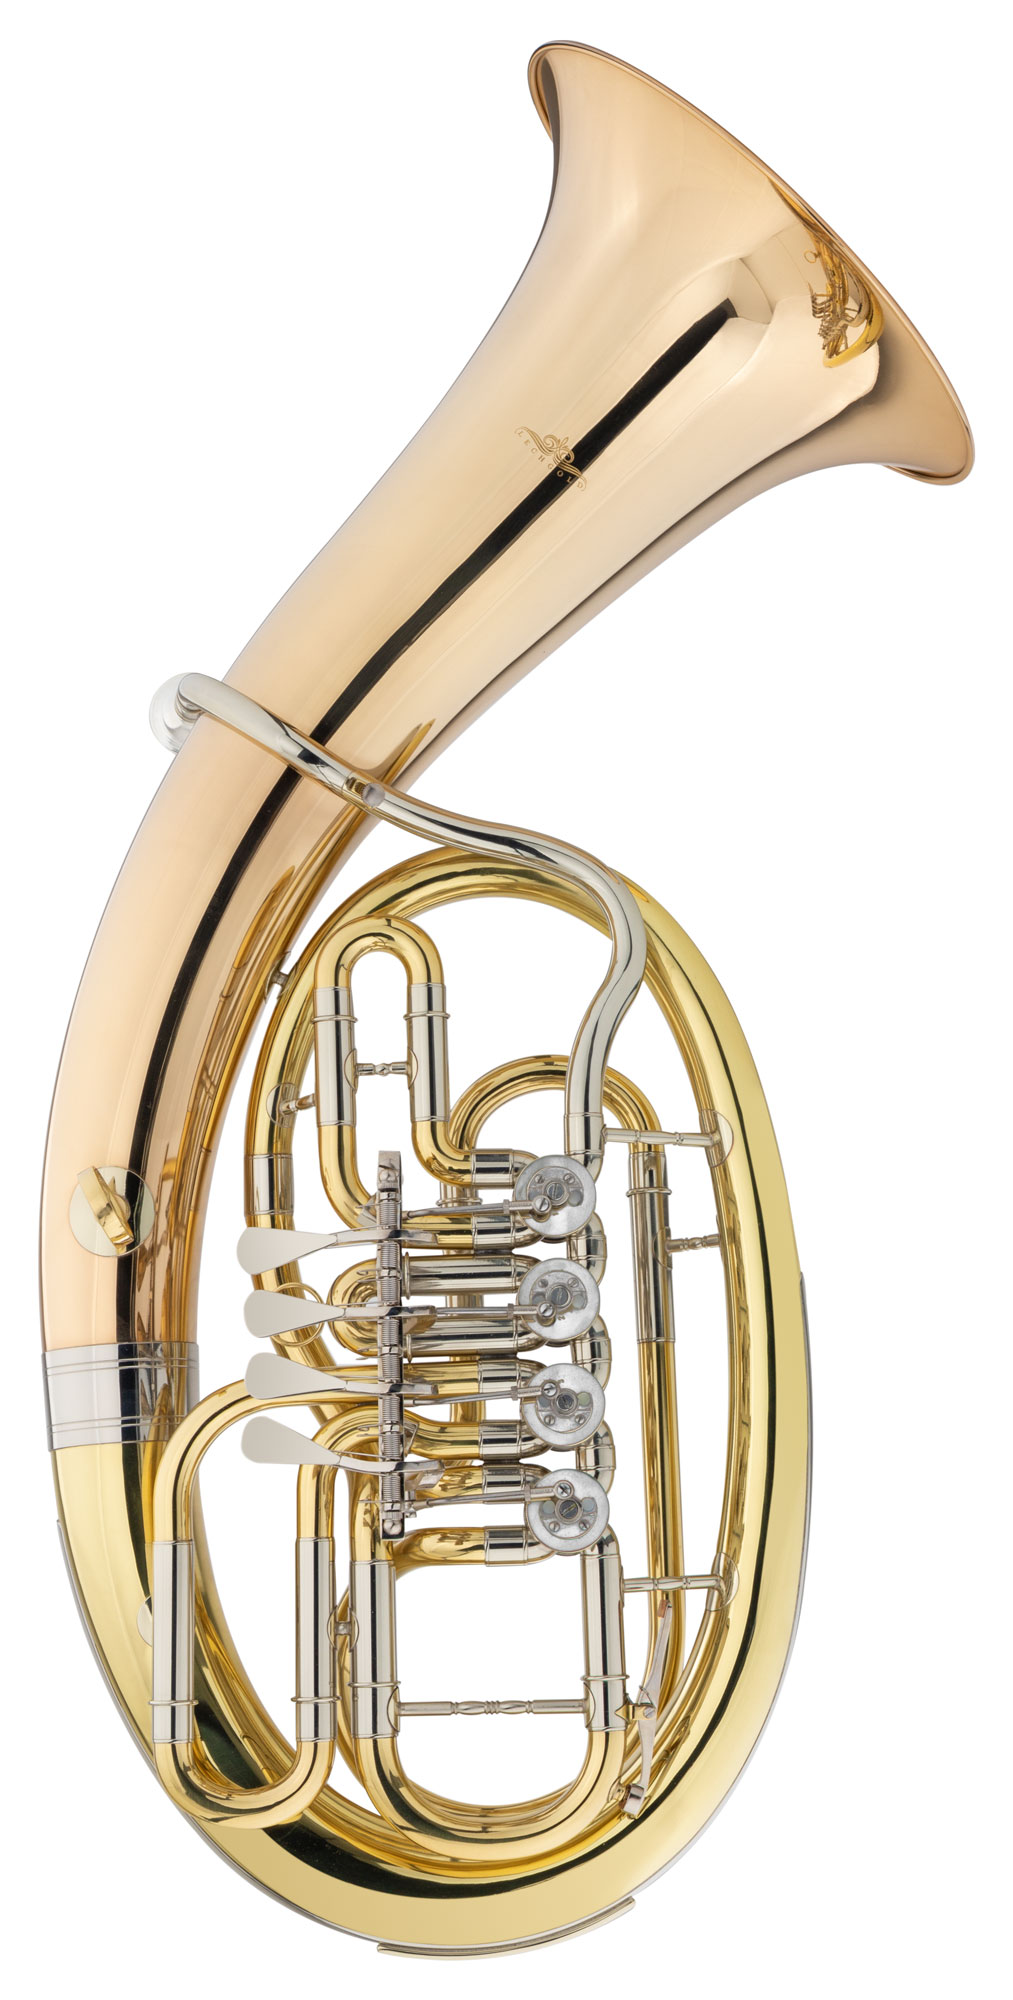 Baritone - Lechgold BH 19|4L Bariton - Onlineshop Musikhaus Kirstein